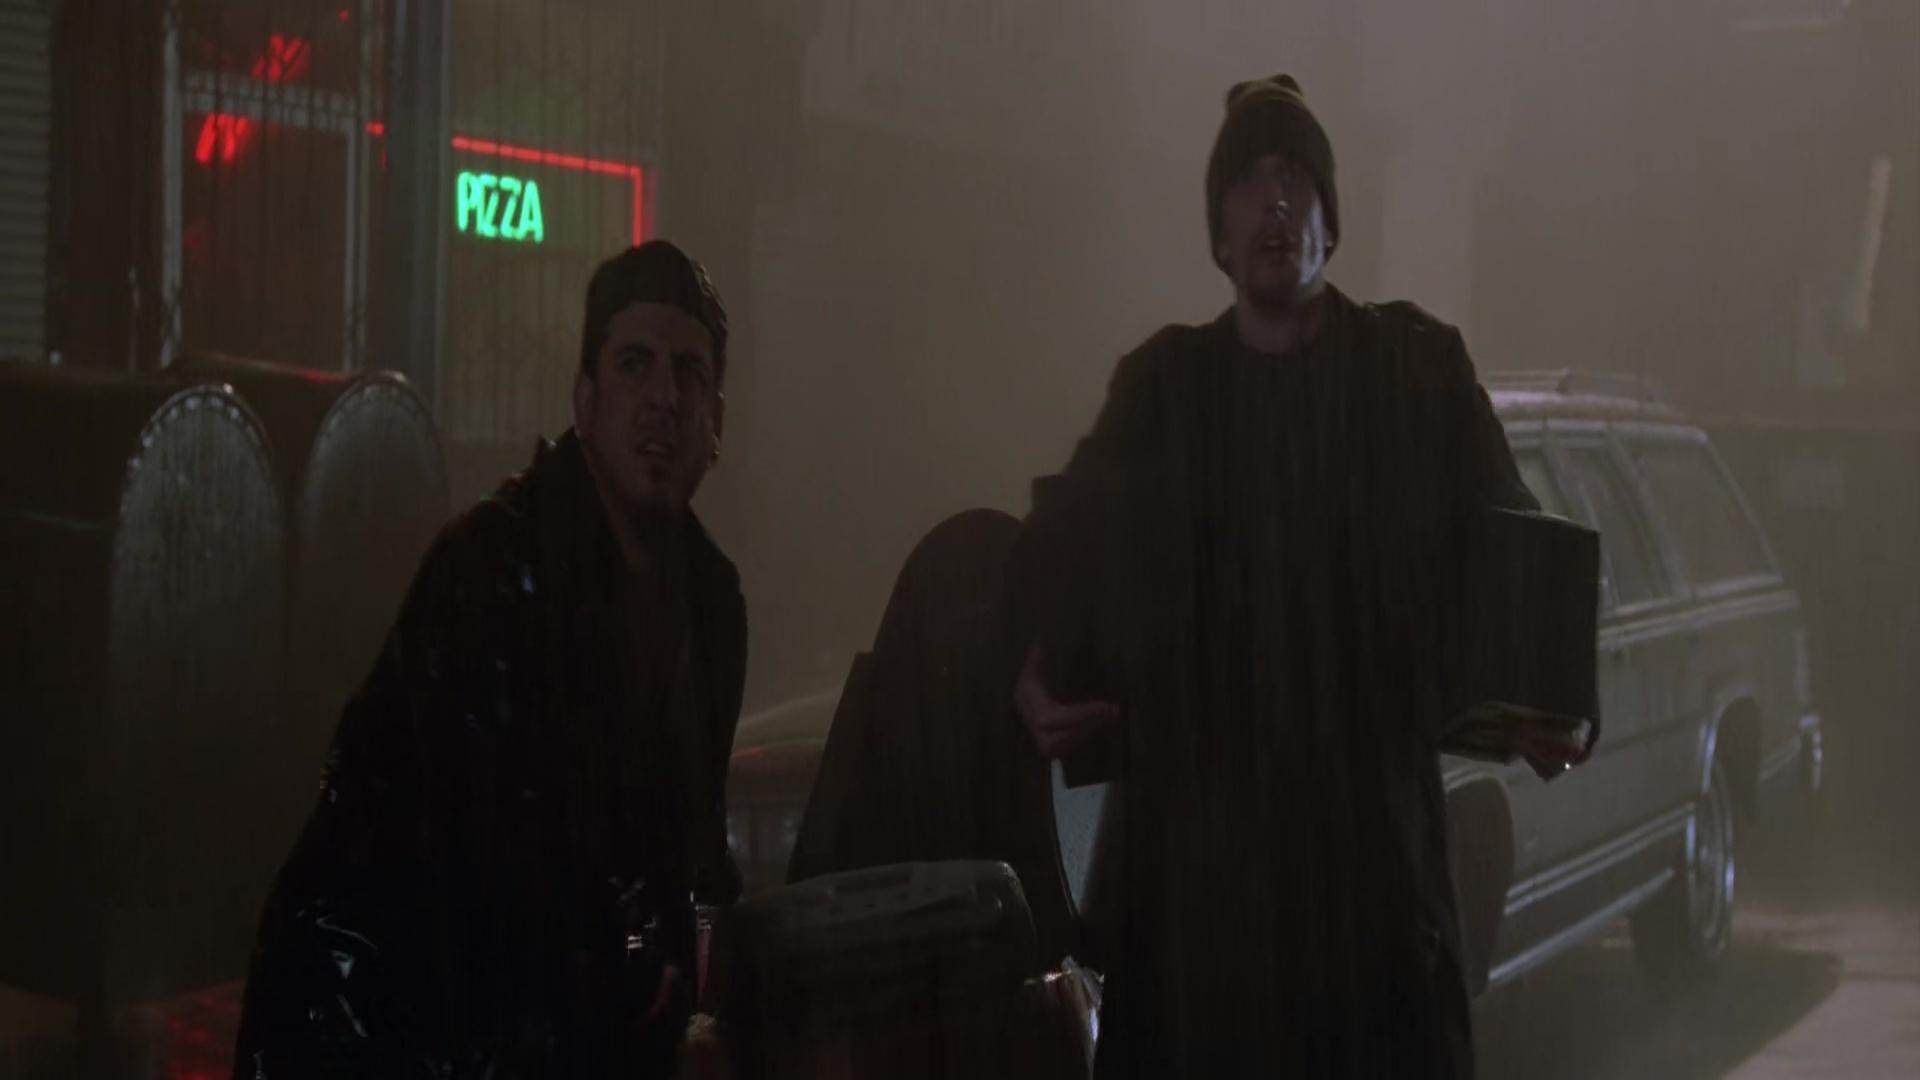 Godzilla 1998 film still 6